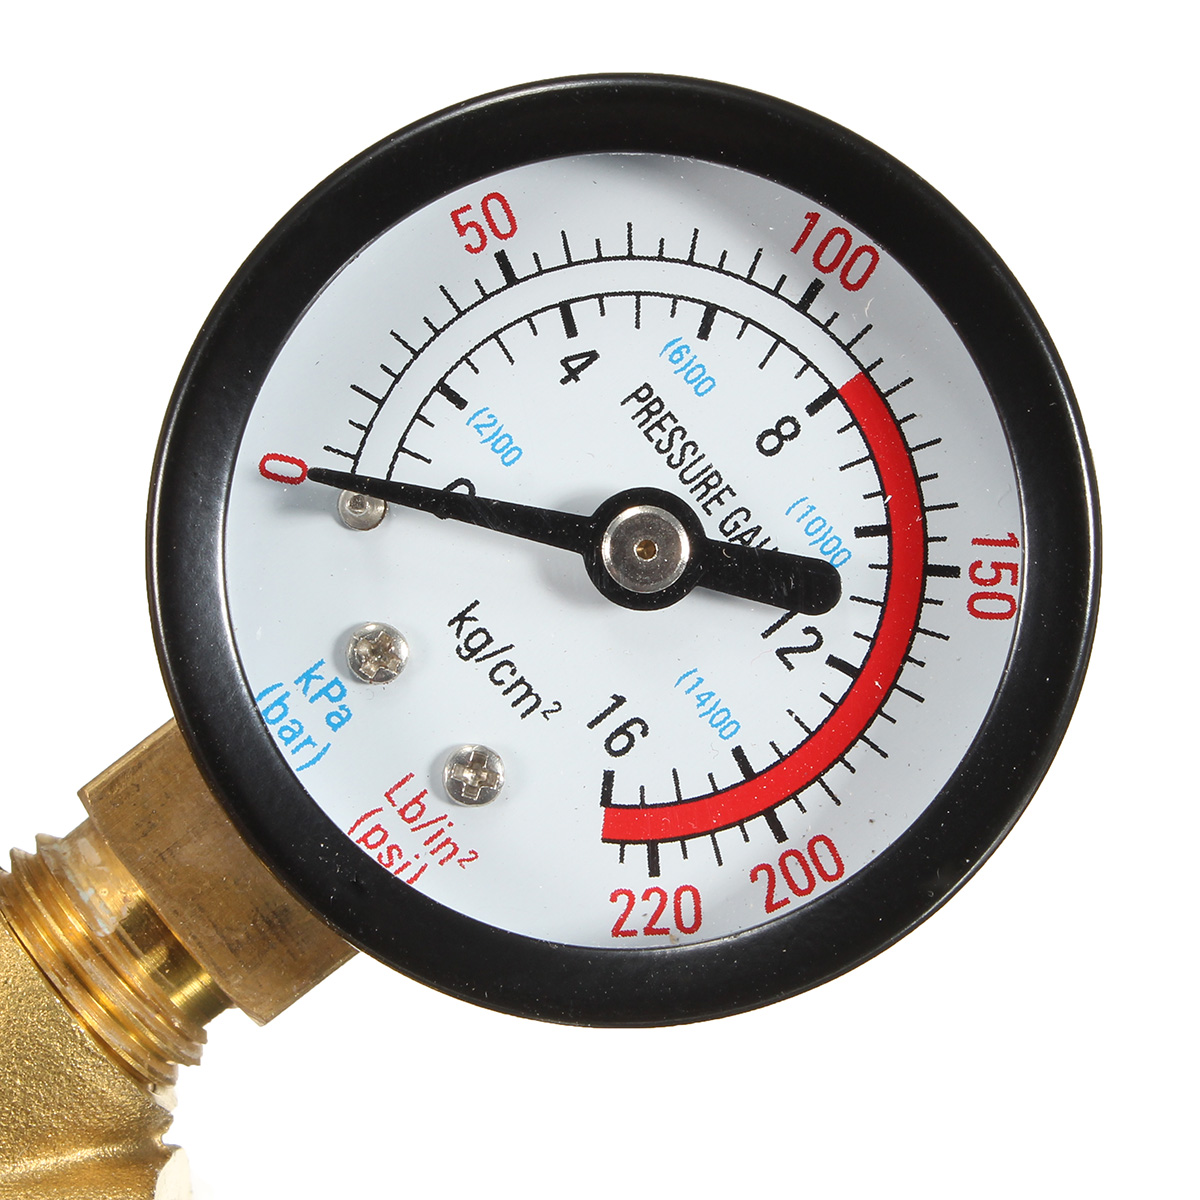 dn20 npt 3 4 adjustable brass water pressure regulator reducer with gauge met. Black Bedroom Furniture Sets. Home Design Ideas